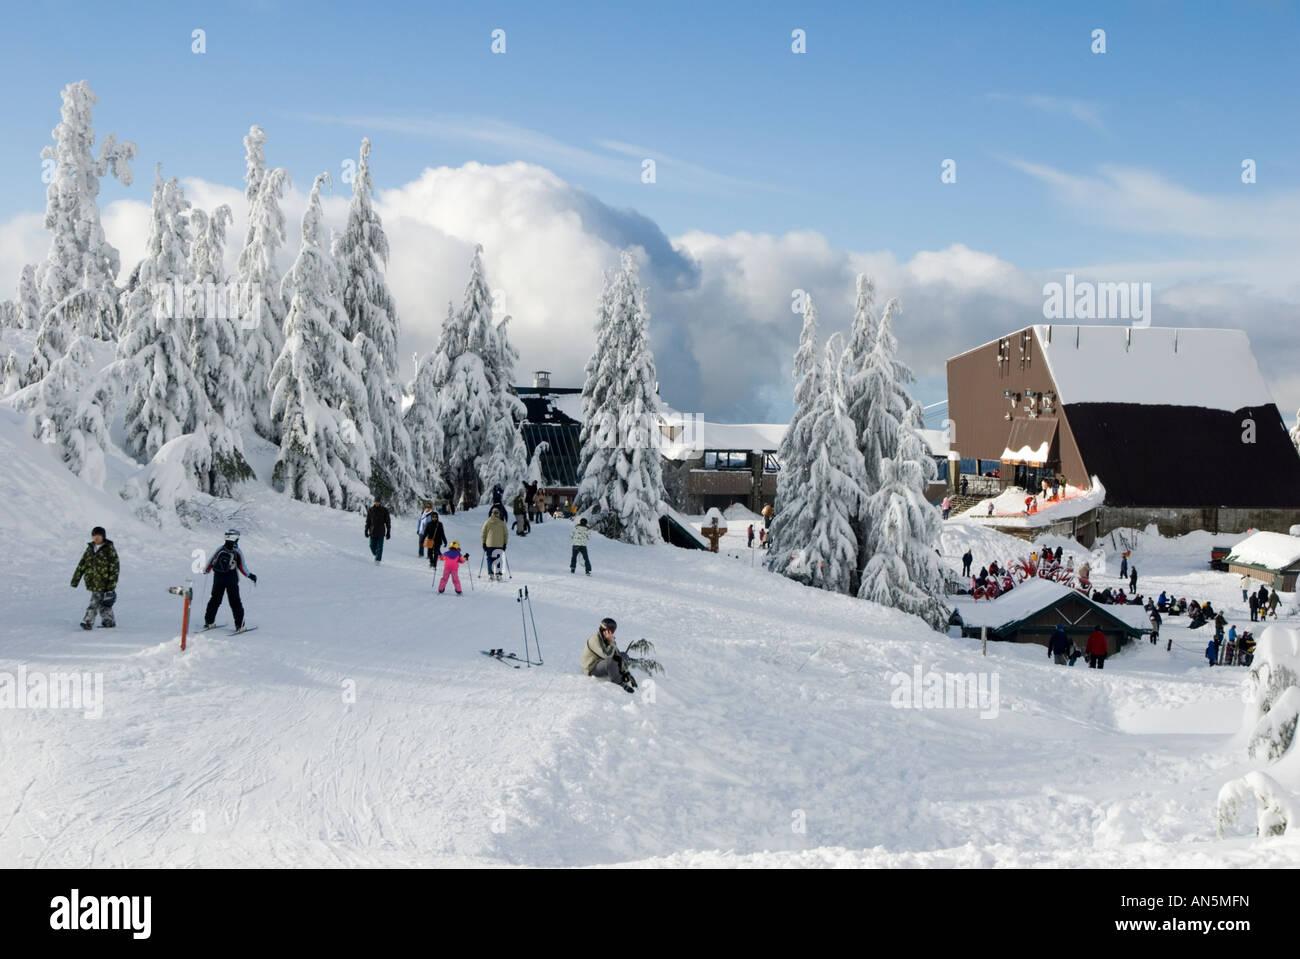 grouse mountain ski resort, north, vancouver, british, columbia